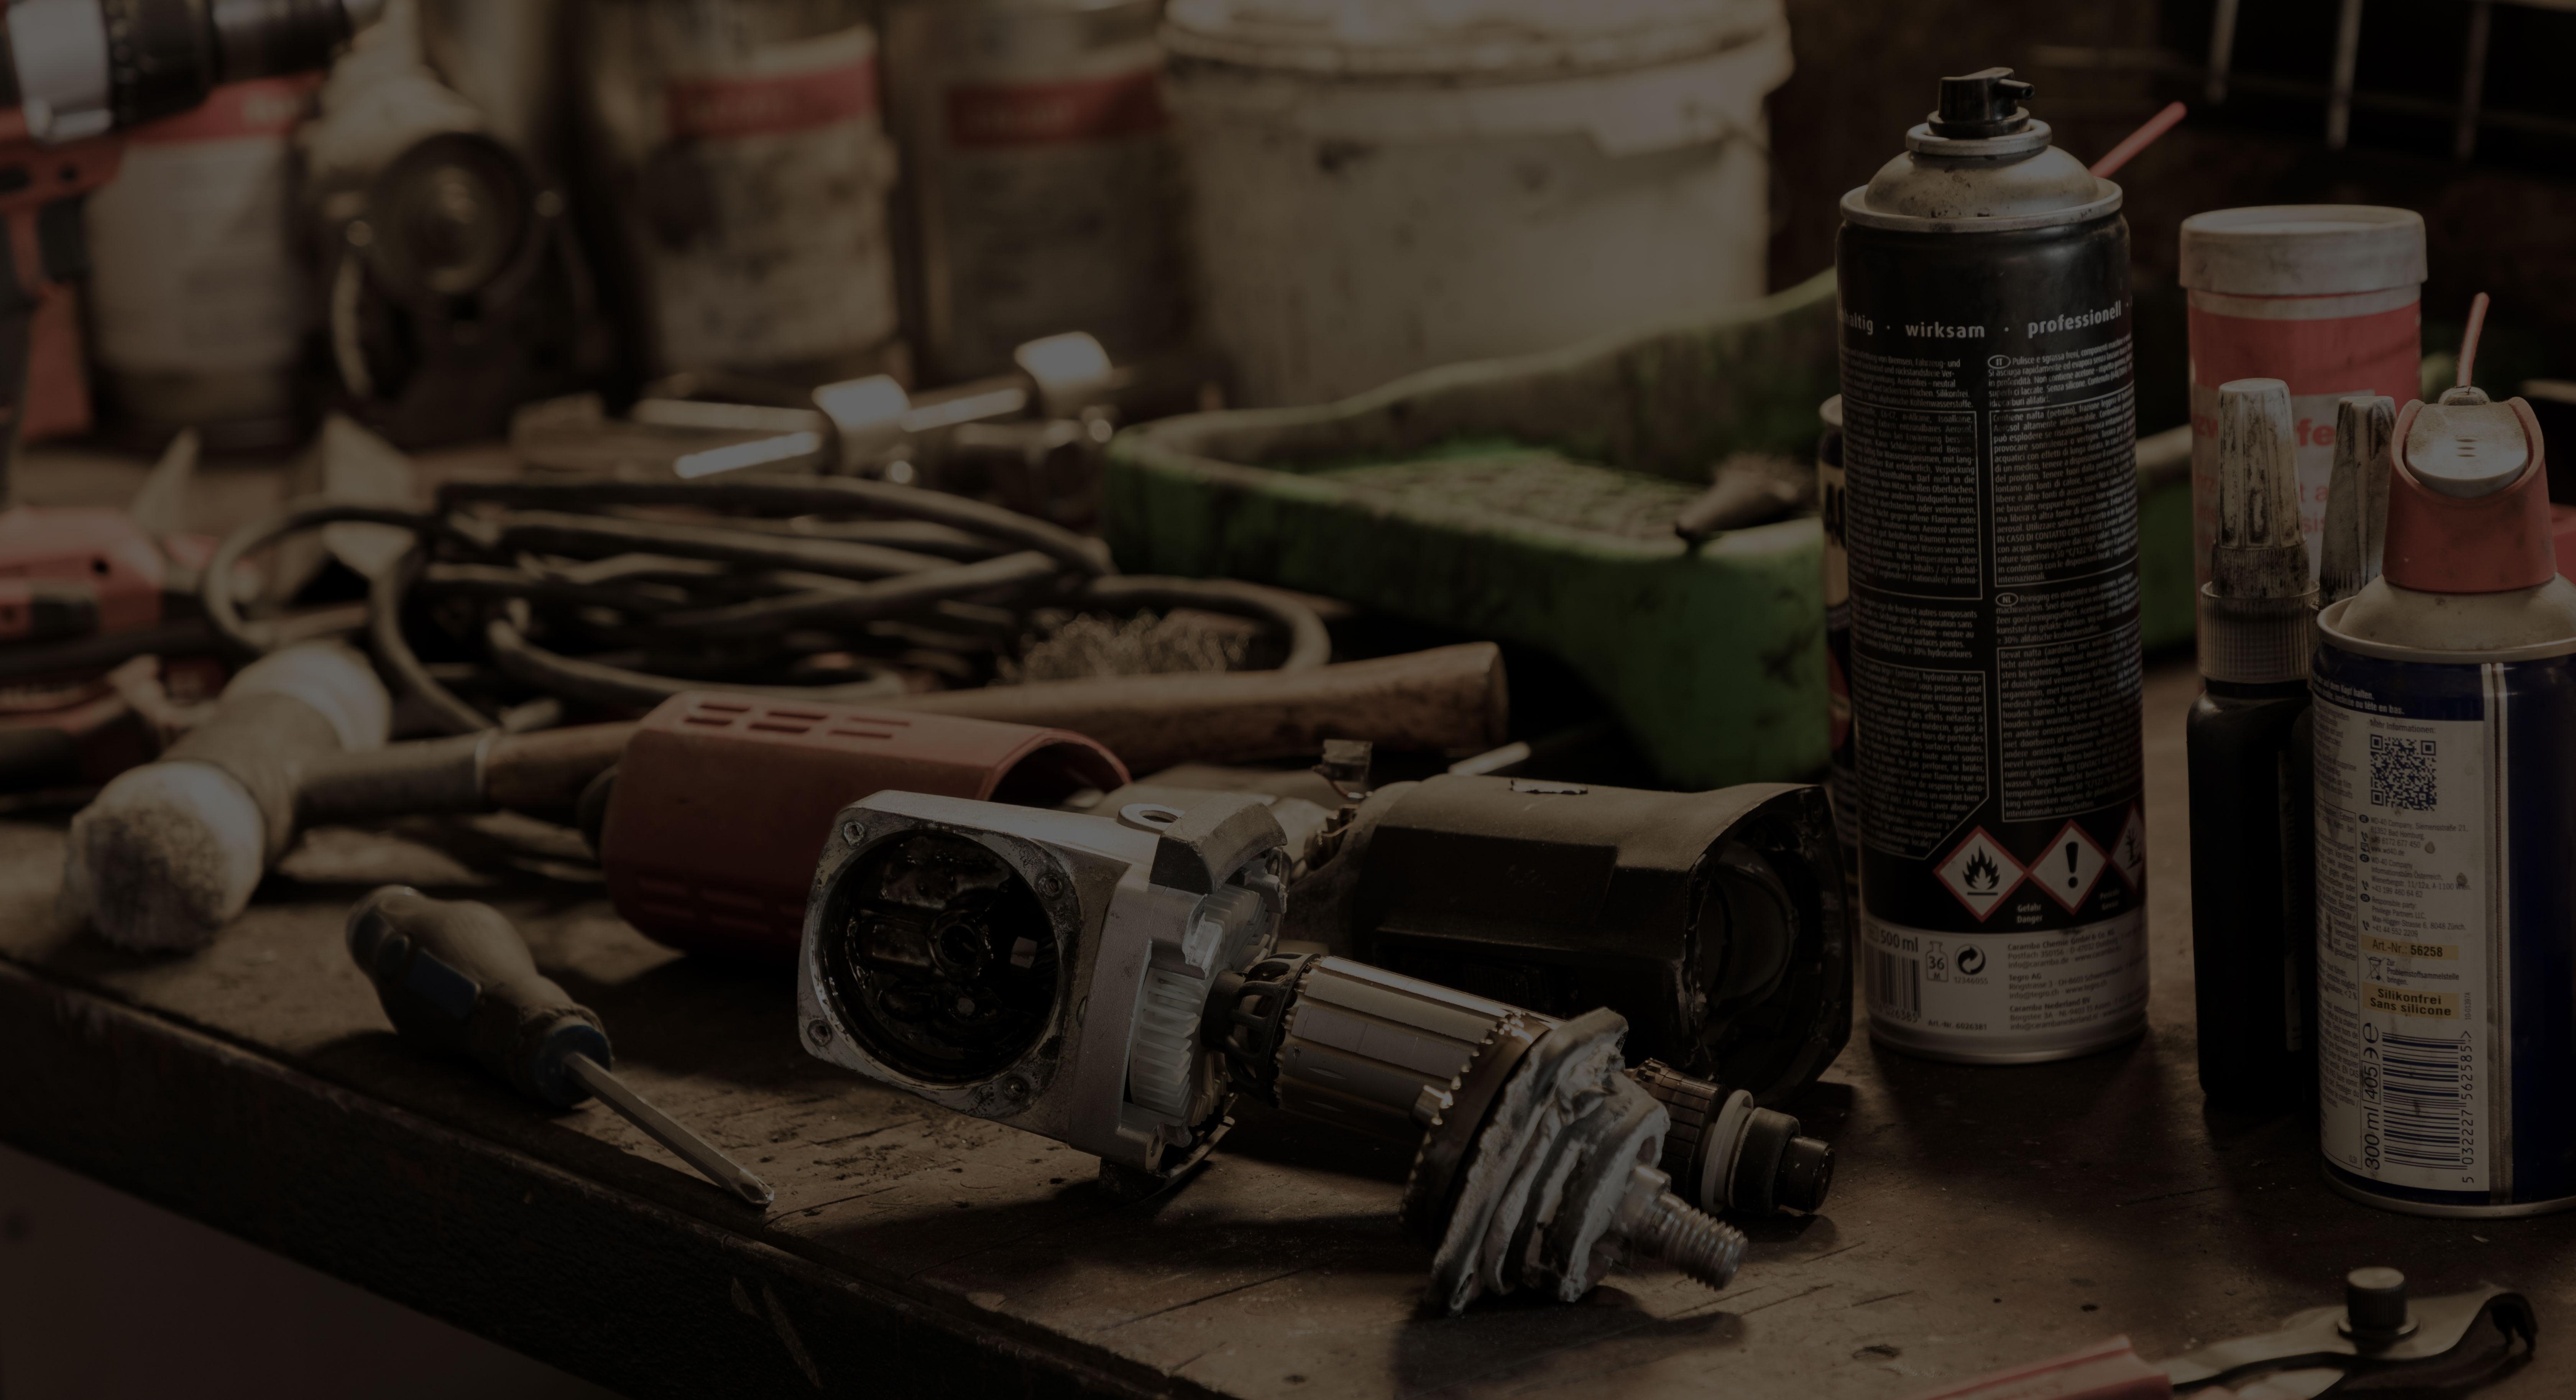 Titelbild_Reparatur_Werkstatt